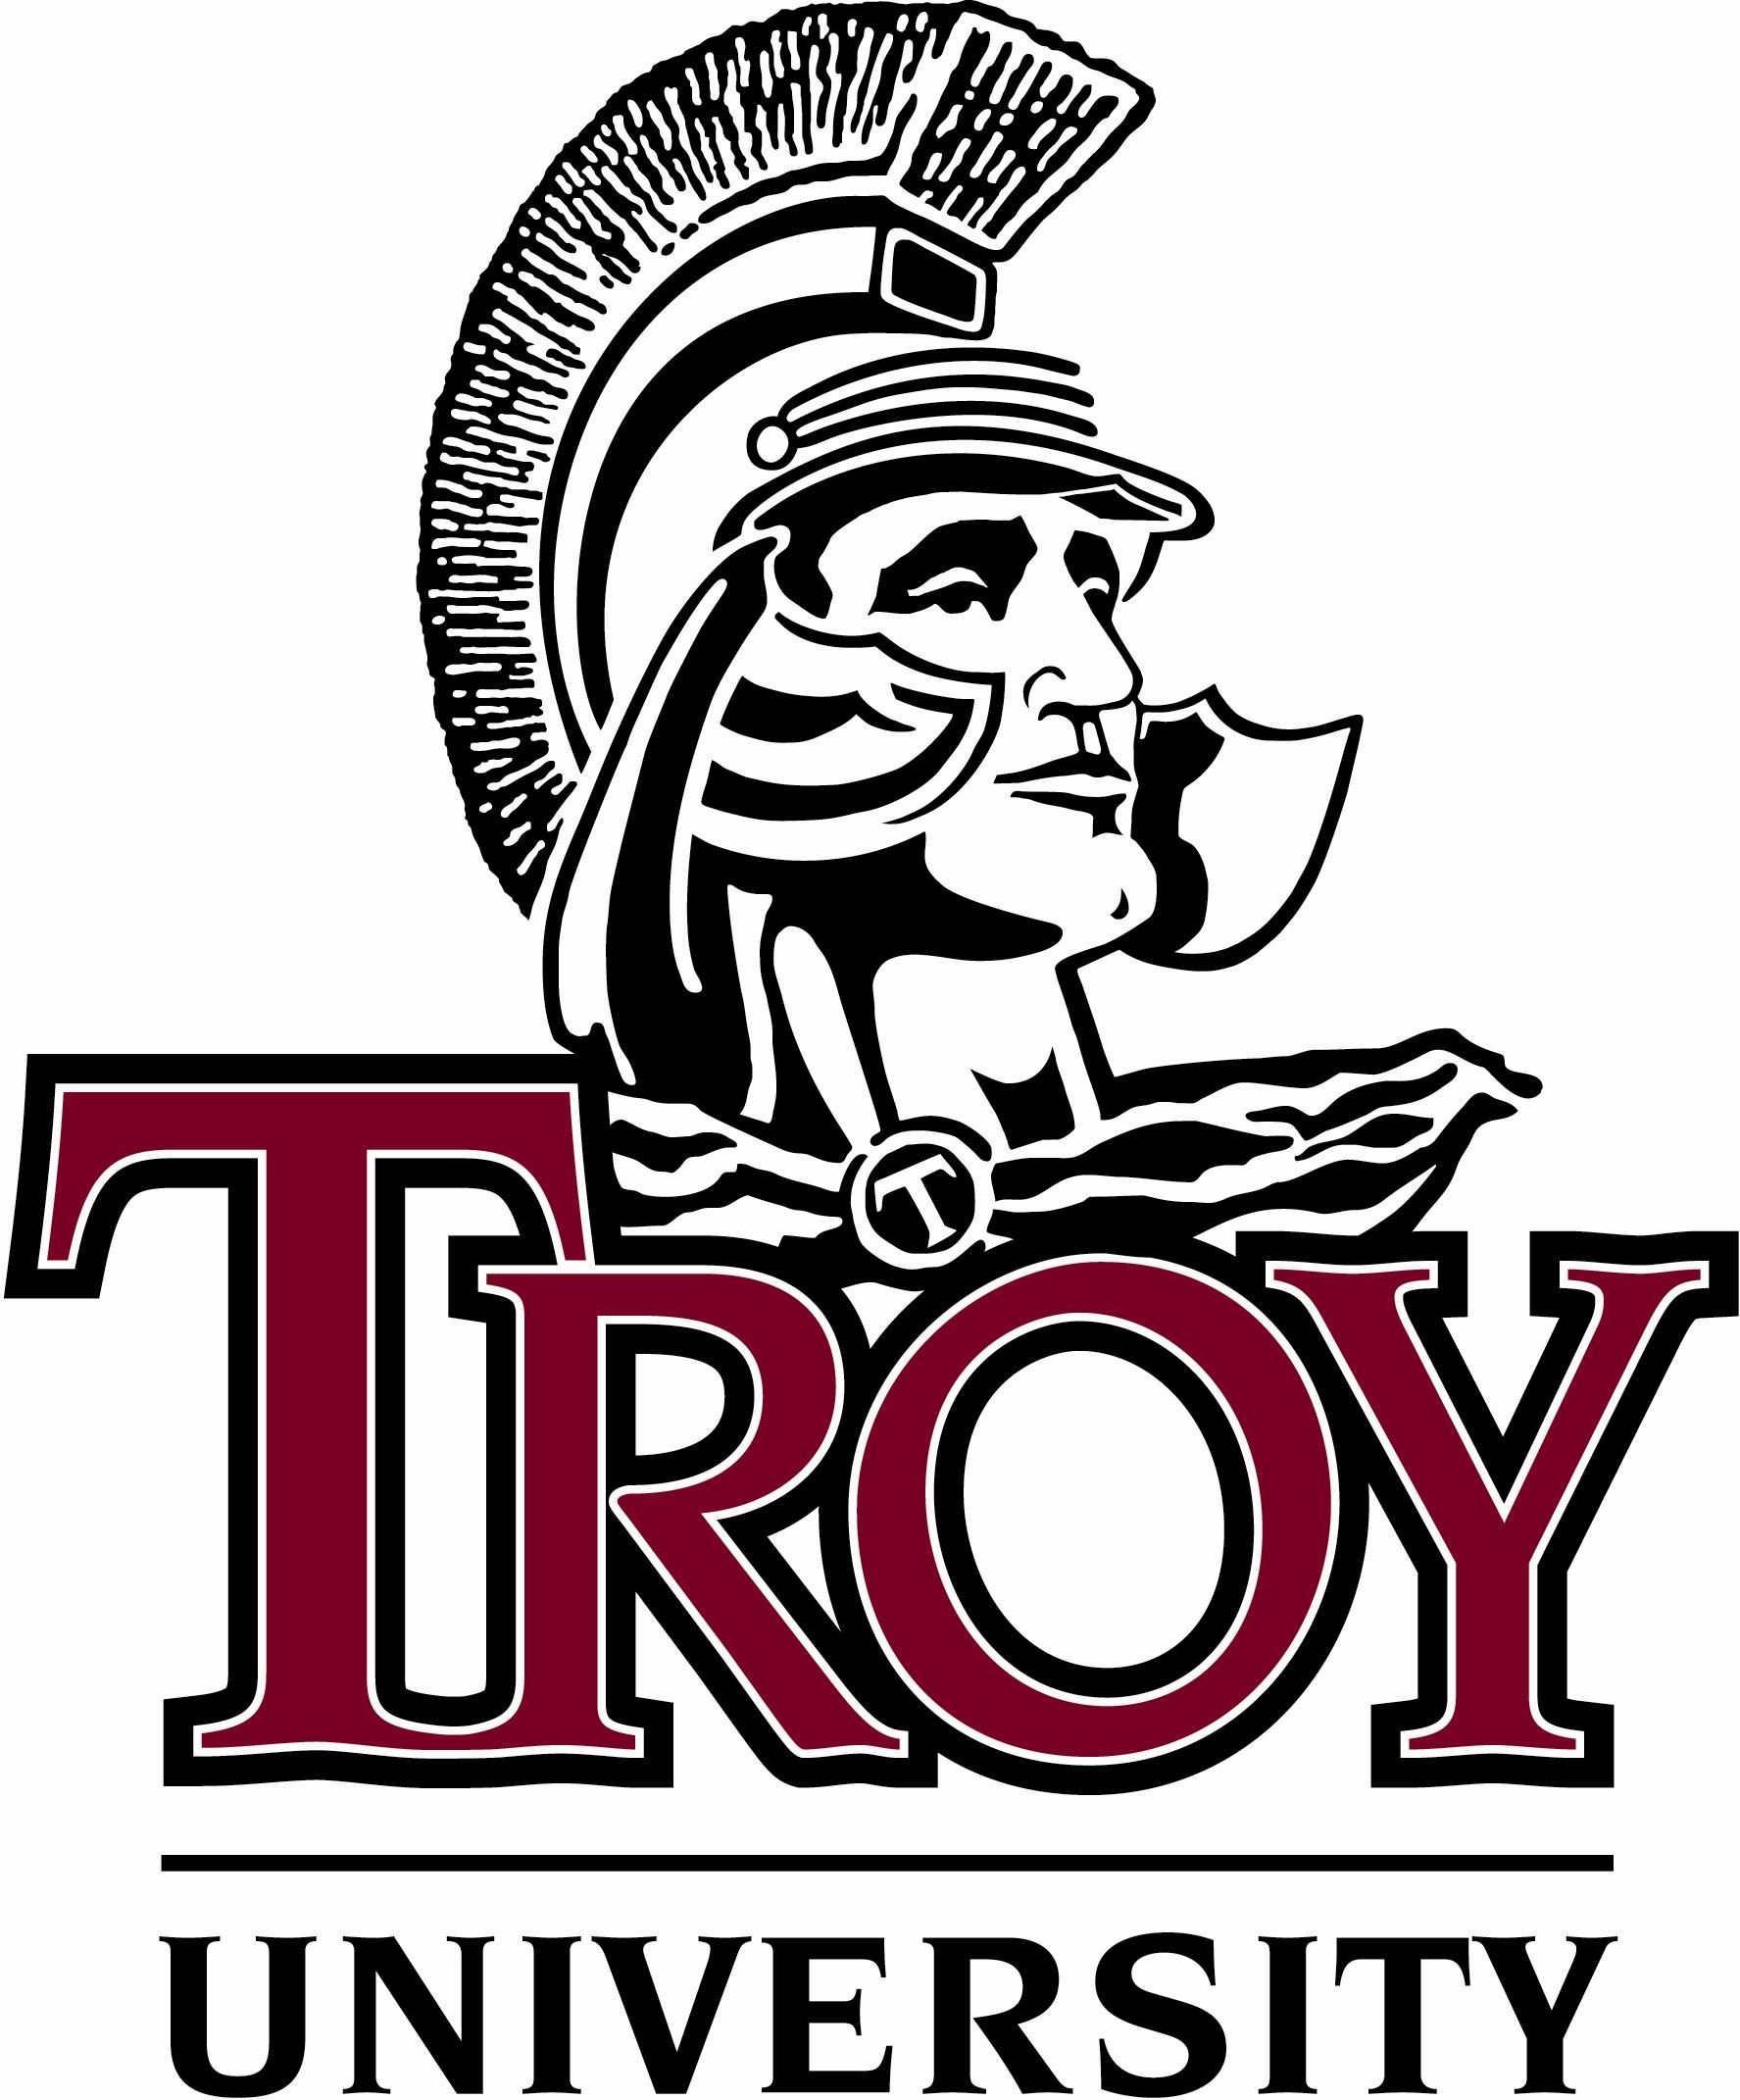 Troy university clipart.